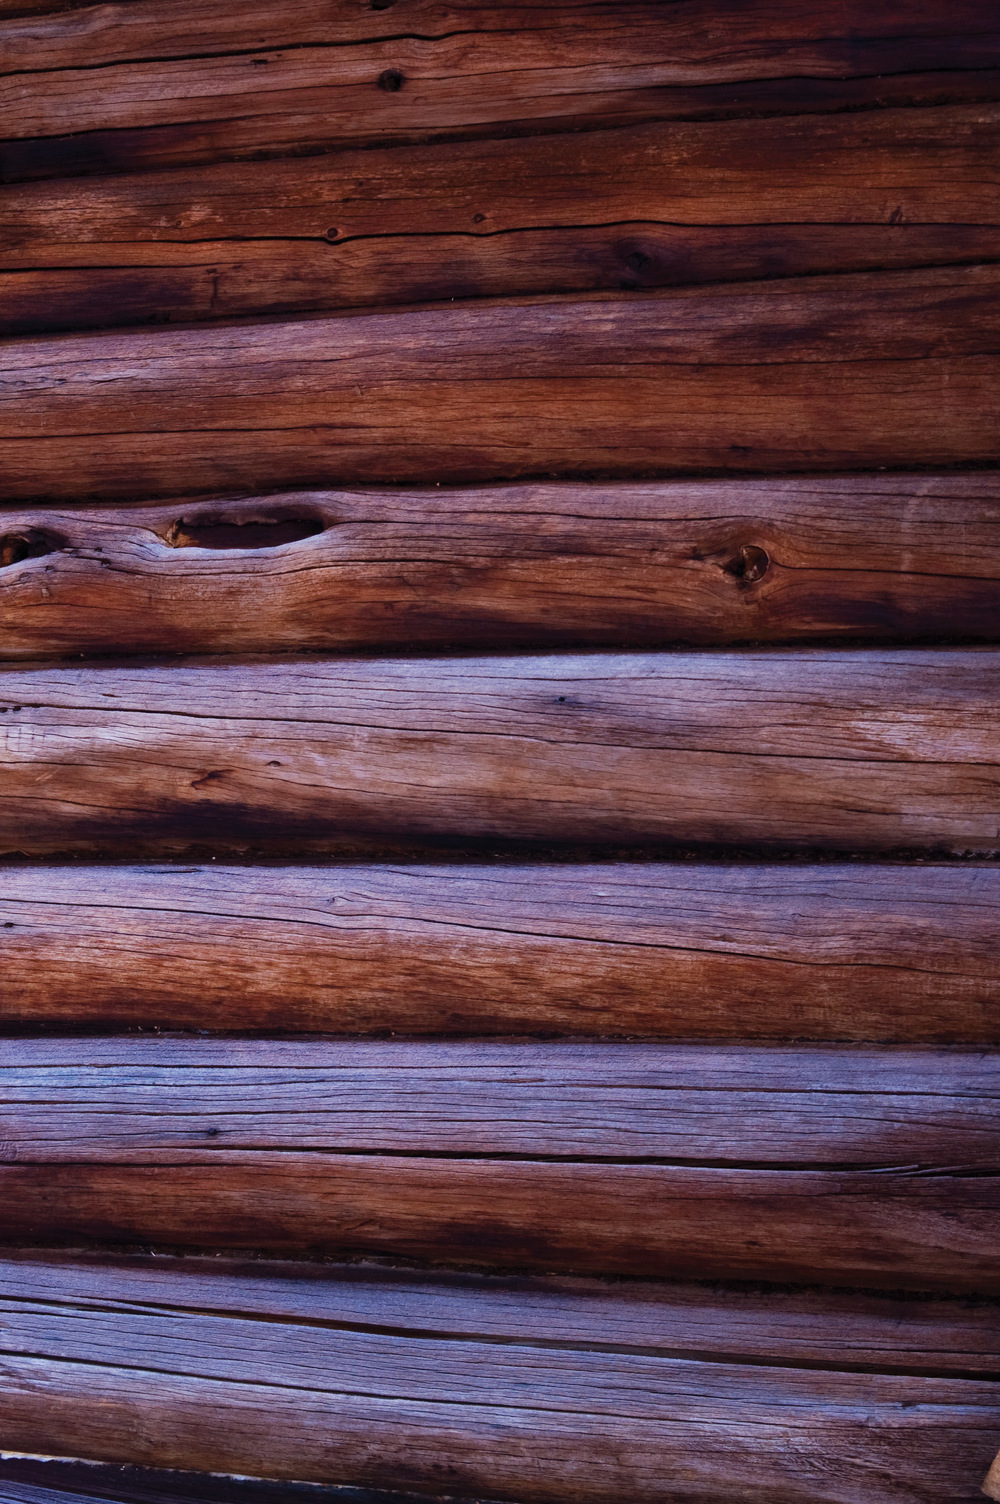 Tjæreimpregnert tømmervegg. Foto: Lars Sandved Dalen, NIBIO